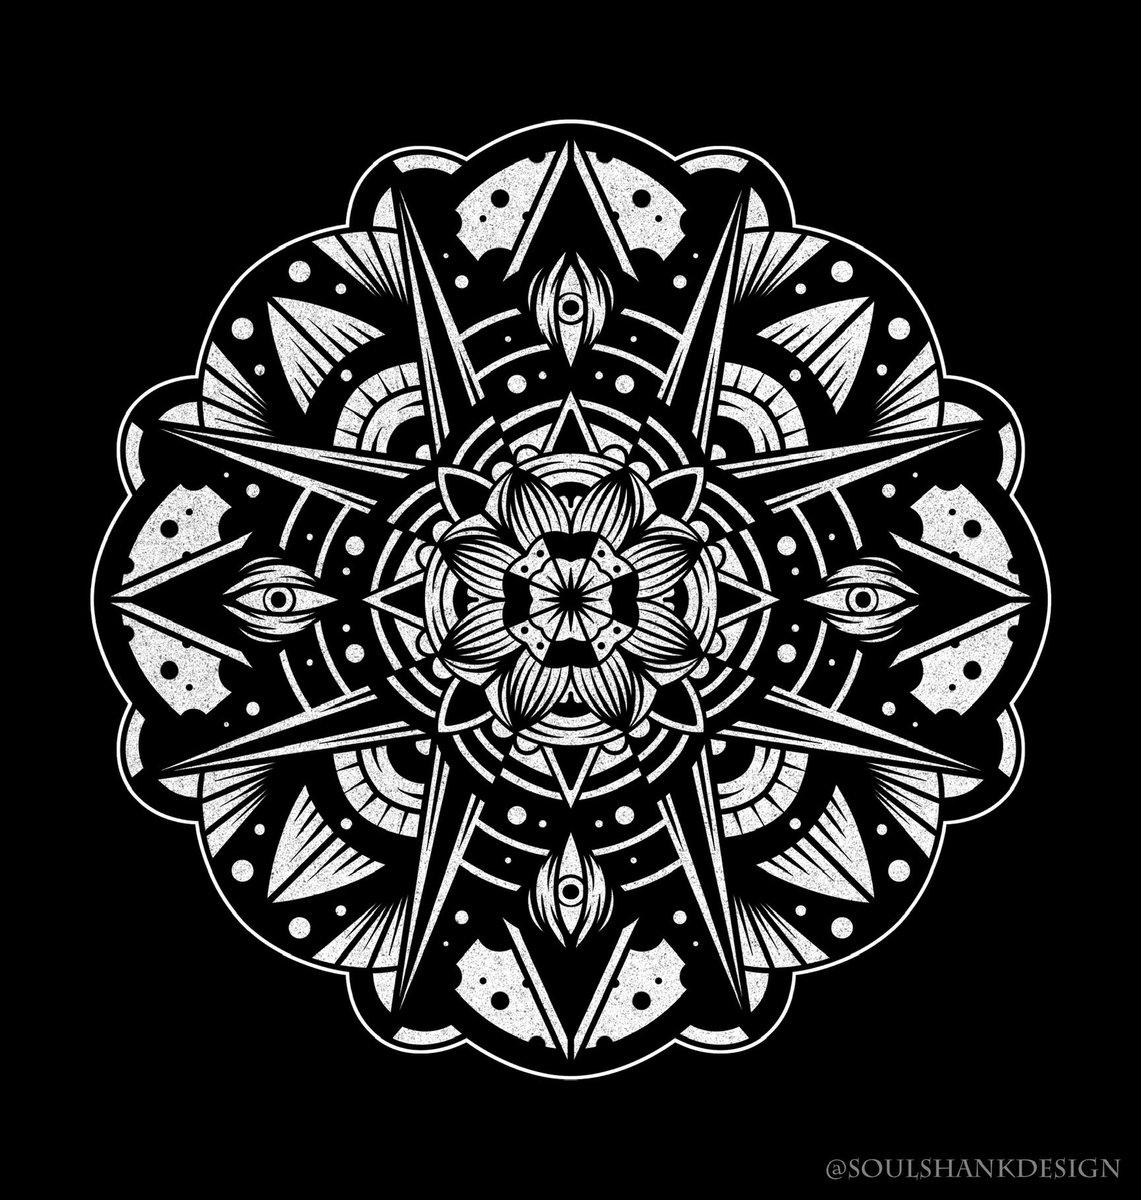 Been drawing mandalas fun and free flowing recently, do you like them? 😴  . . . #illustration #design #graphic #fun #mandala #mandalas #geometry #pattern #patterns #dotwork #linework #blackwork #art #artwork #digitalart #digitalillustration #procreate #photoshop #bold